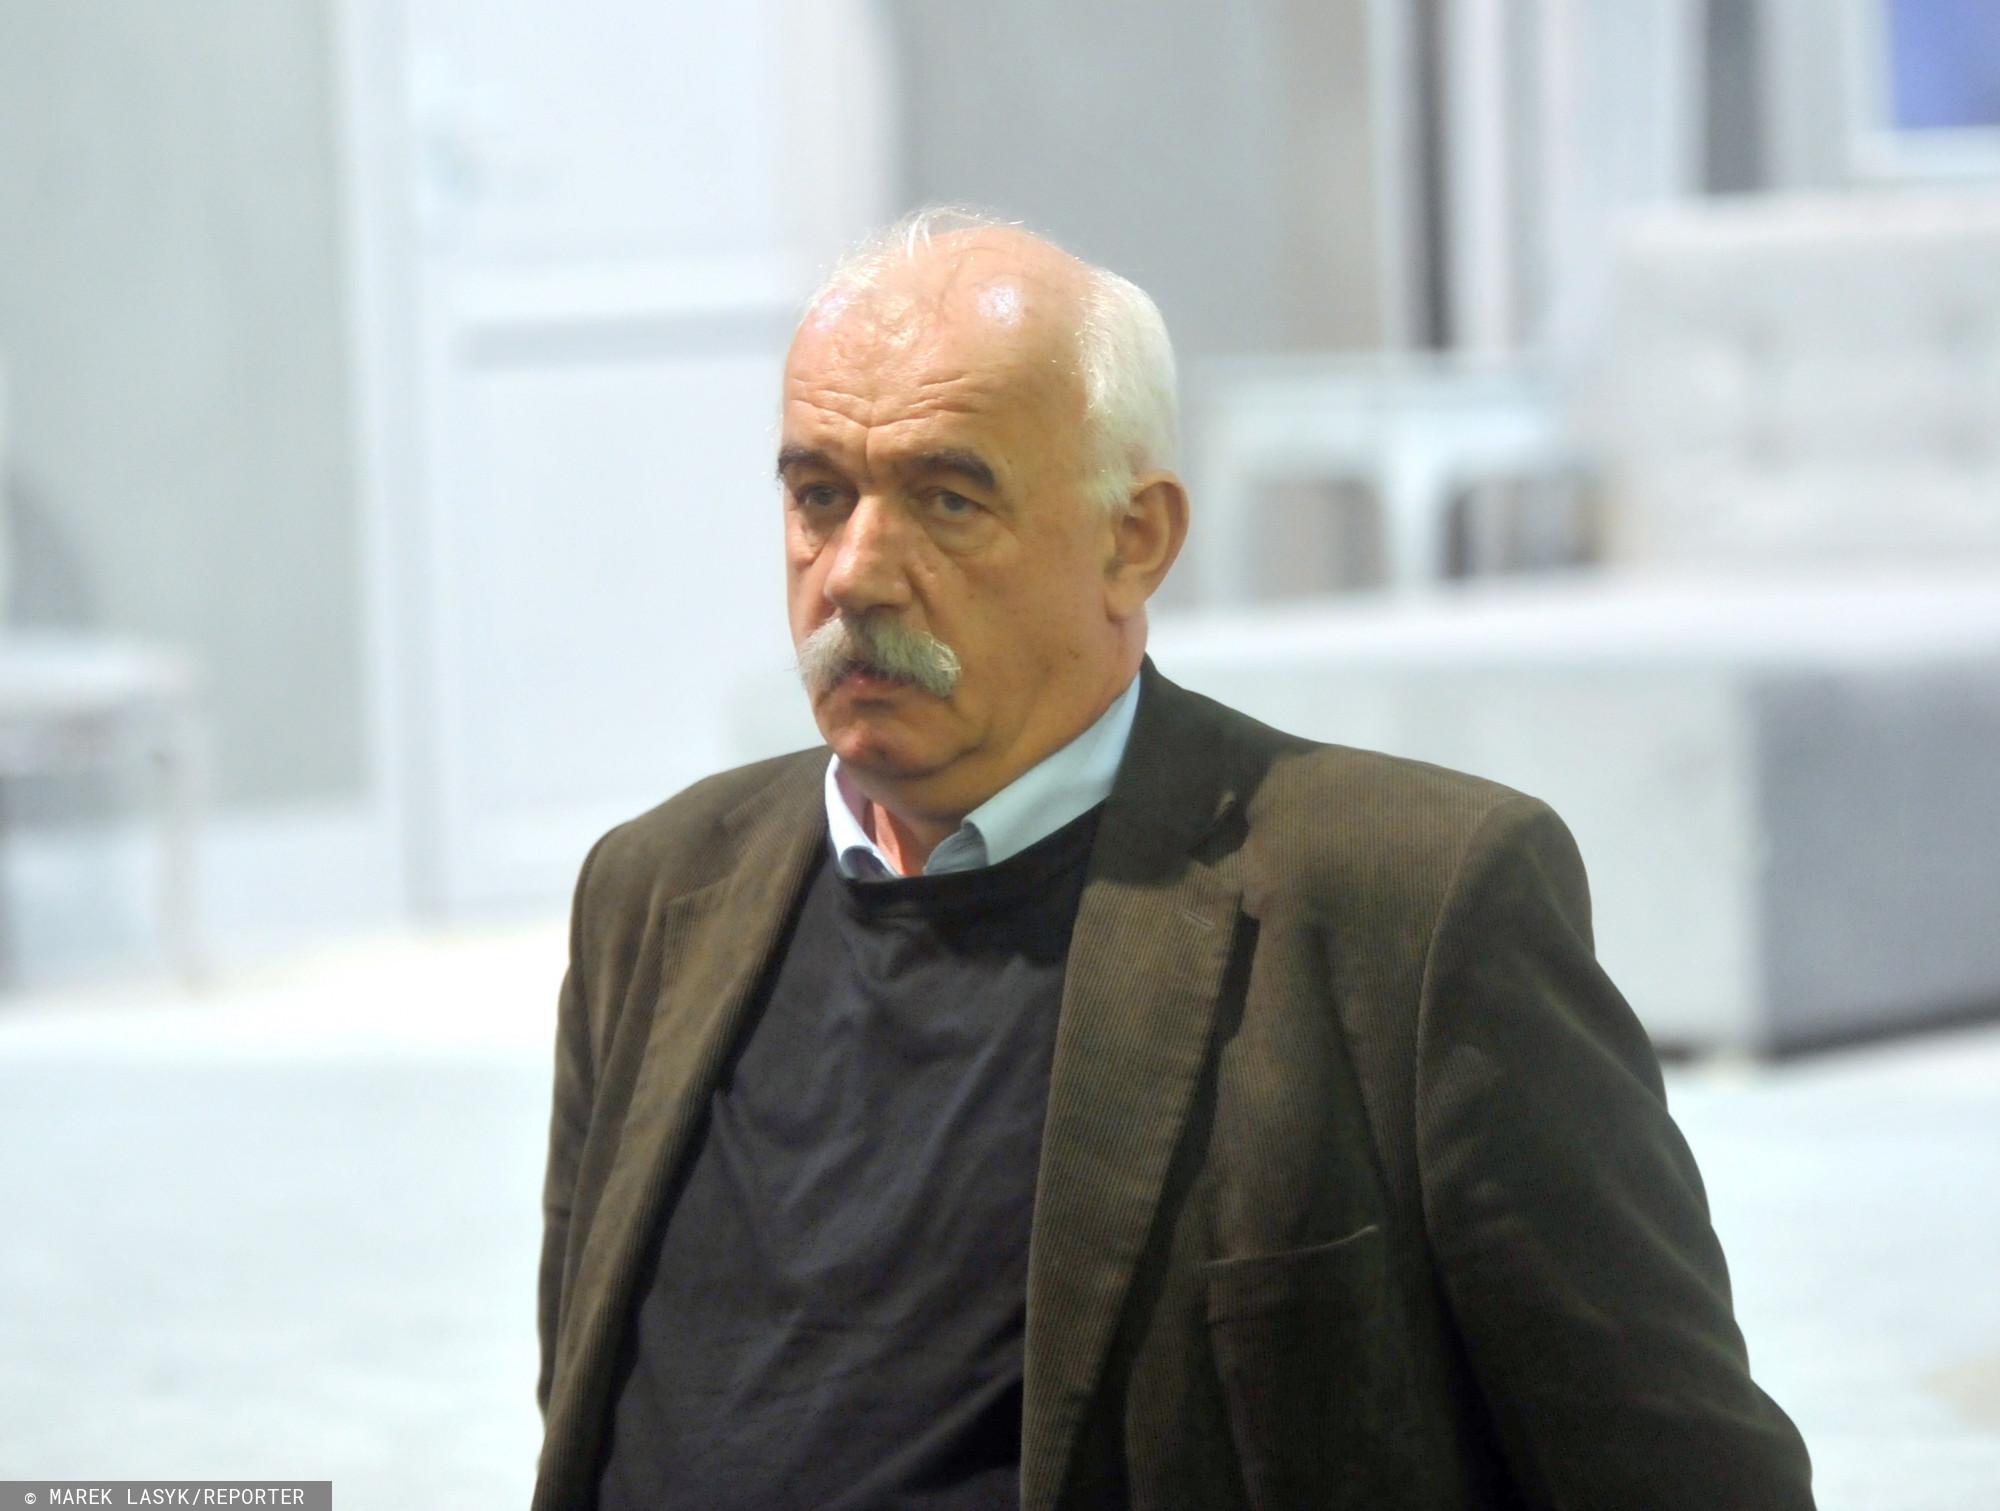 Krakow Aktorki Oskarzaja Dyrektora Teatru Bagatela O Molestowanie